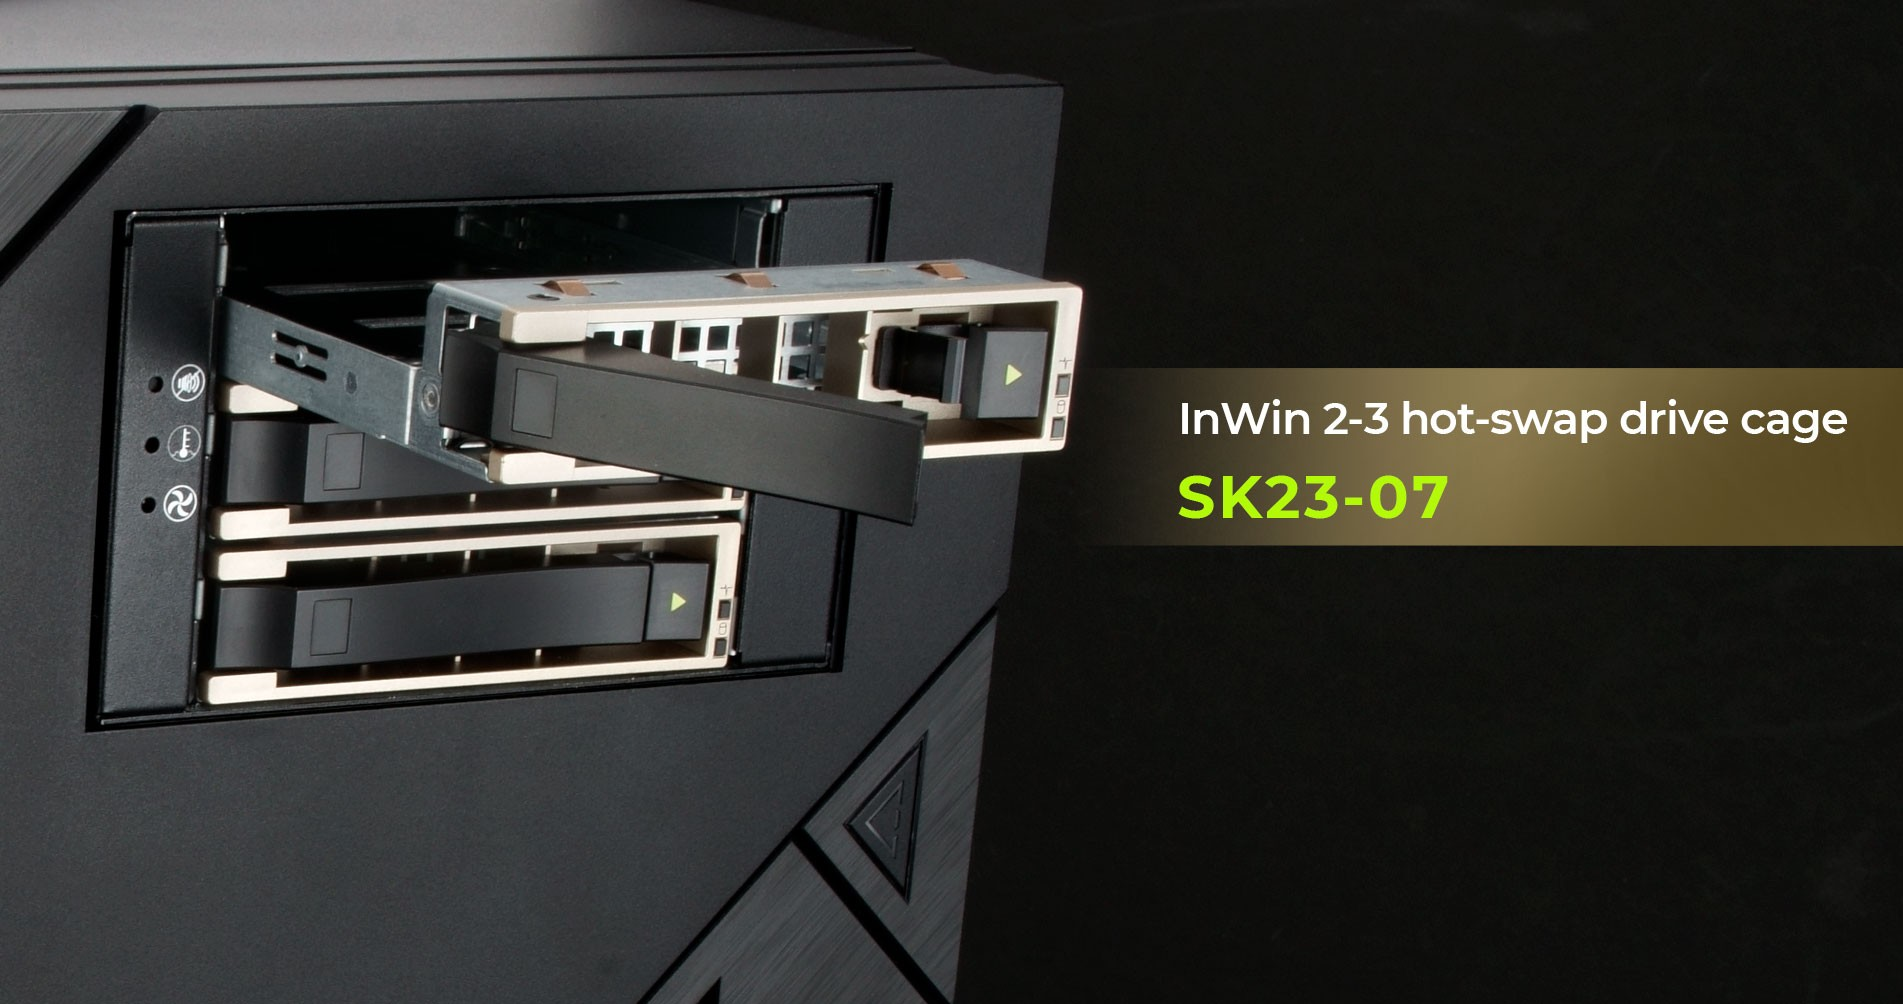 SK23-07